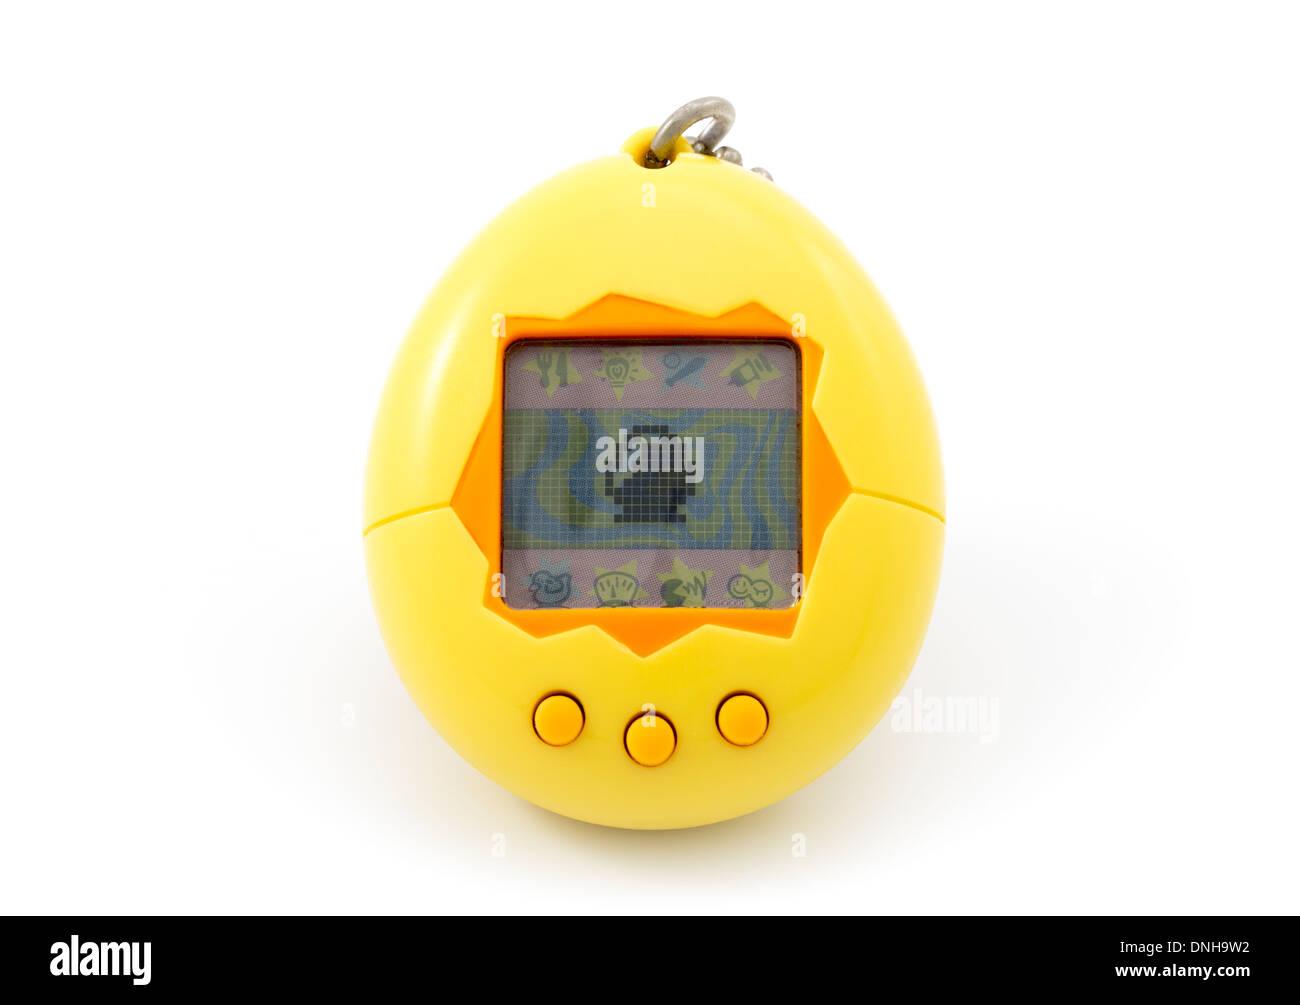 Original Tamagotchi たまごっち toy digital pet aka Tamagotch by Bandai 1996 - Stock Image